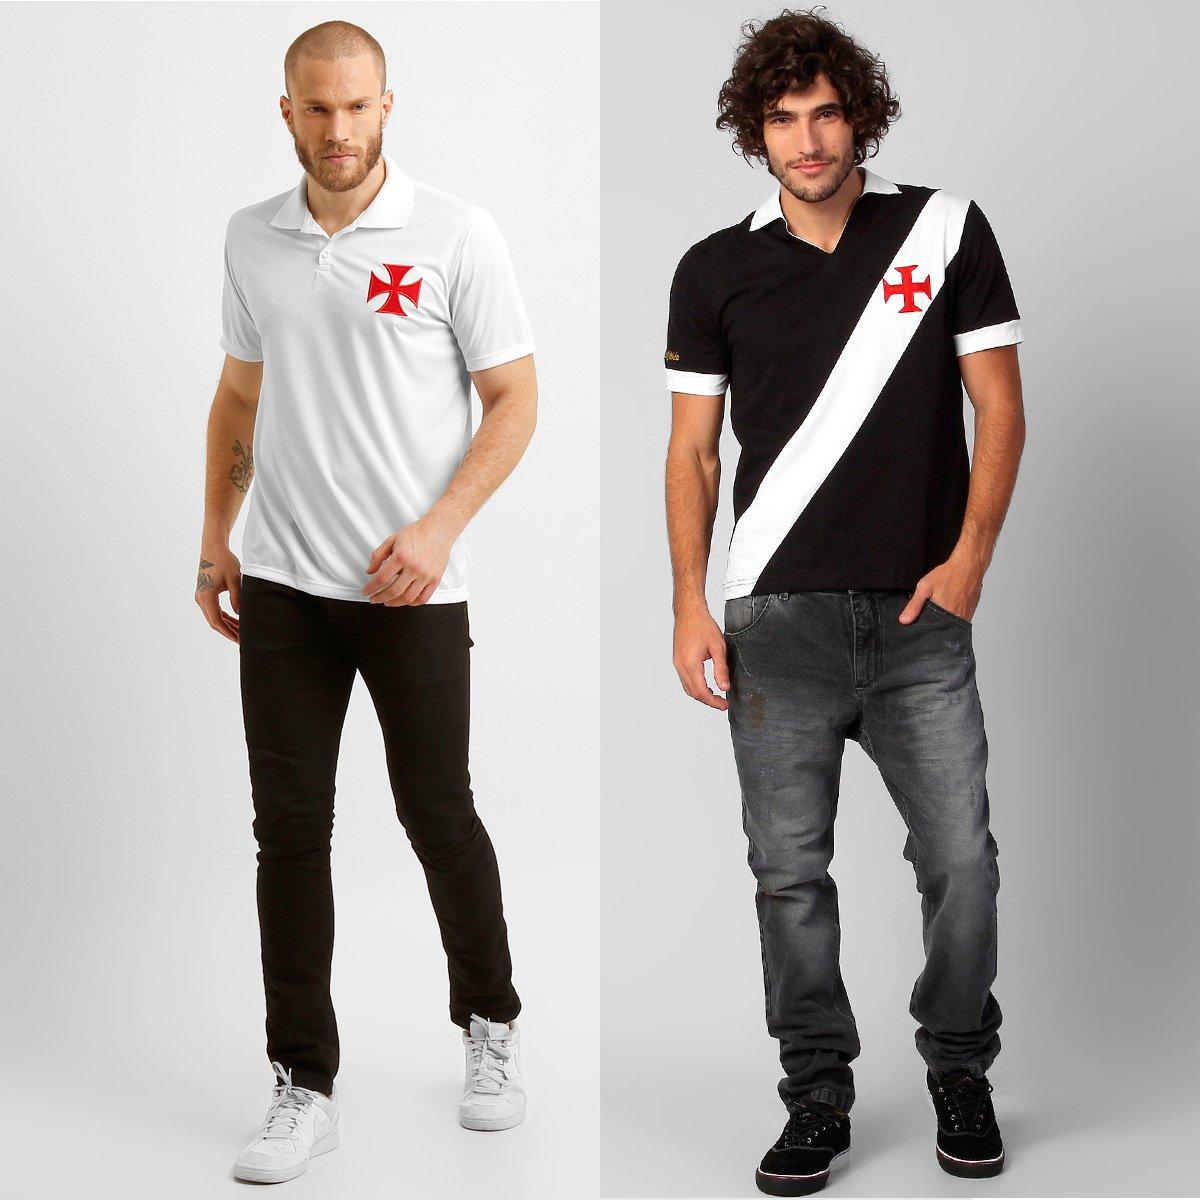 90c116dfdd746 Kit Vasco - Camisa Polo + Camisa Retrô - Compre Agora